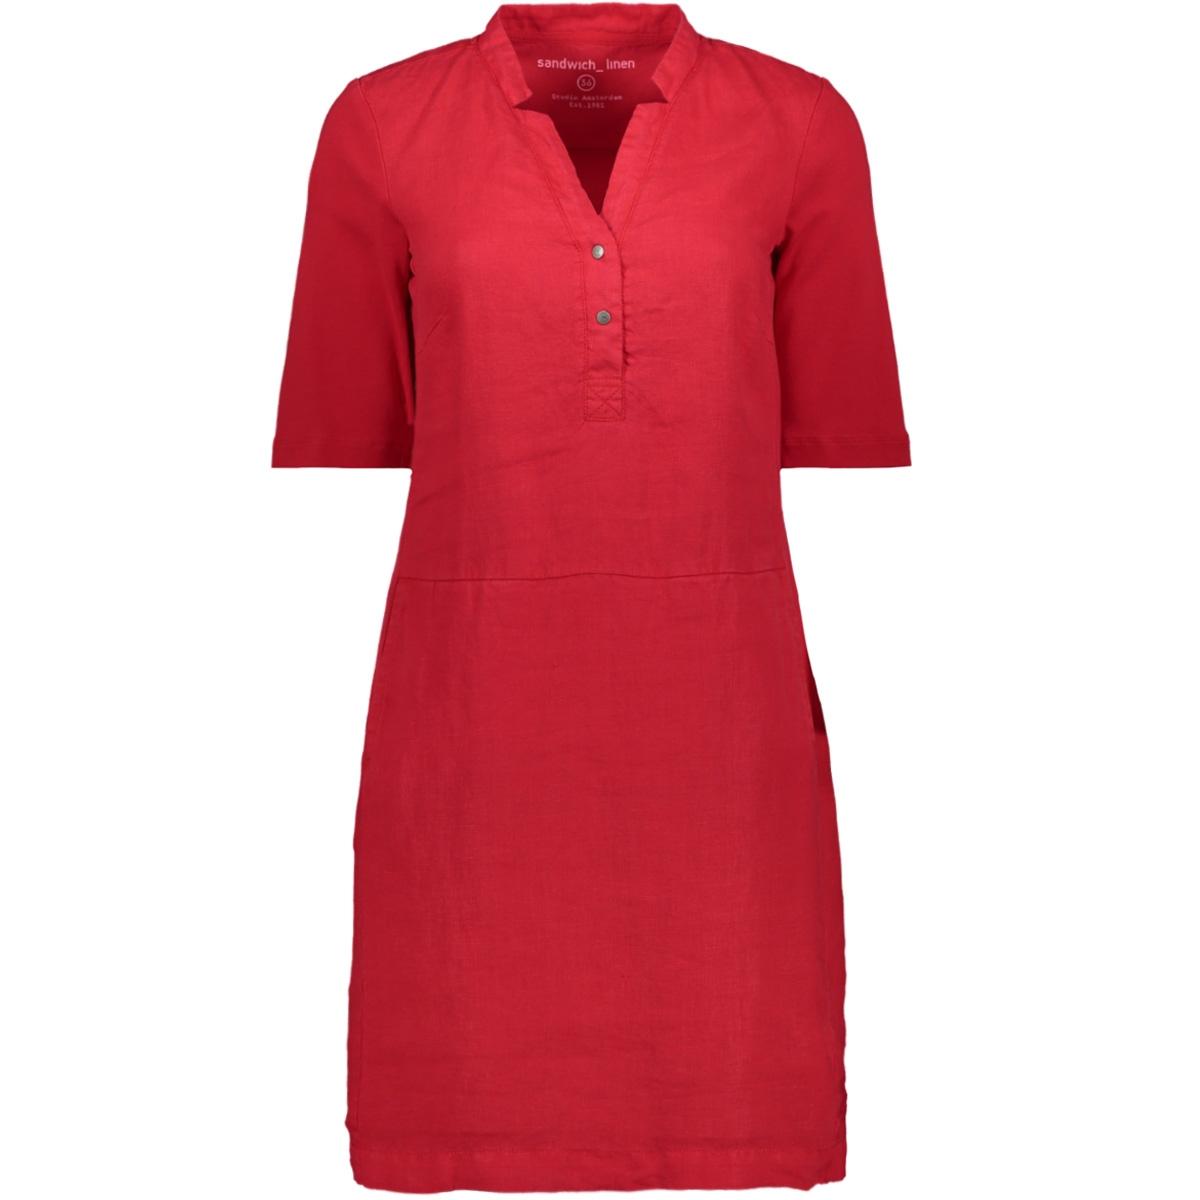 linnen jurk met v hals 23001536 sandwich jurk 20142